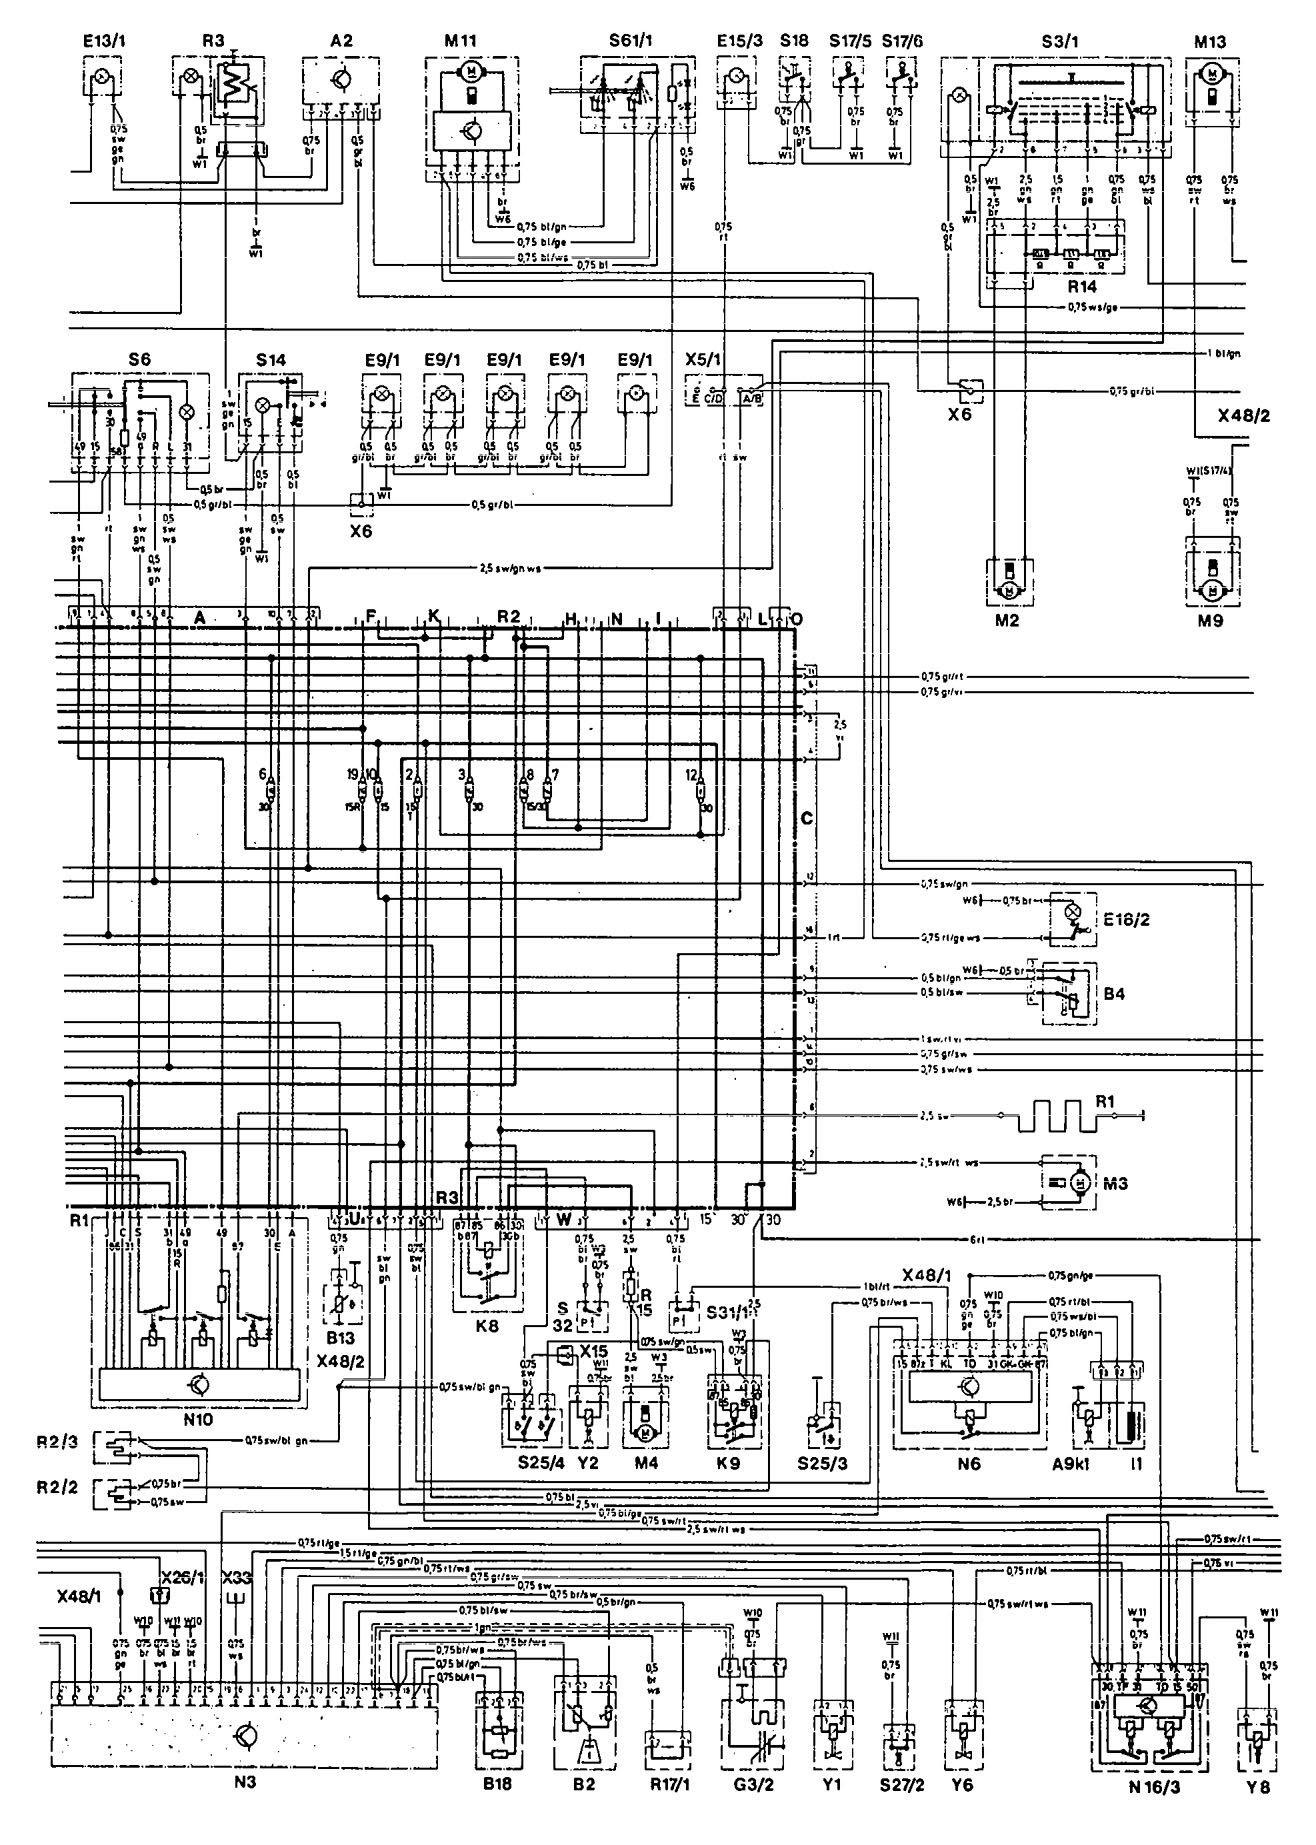 Mercedes Benz 280sl Fuse Diagram Cat5 To Rj12 Wiring Diagram Vga Diau Tiralarc Bretagne Fr